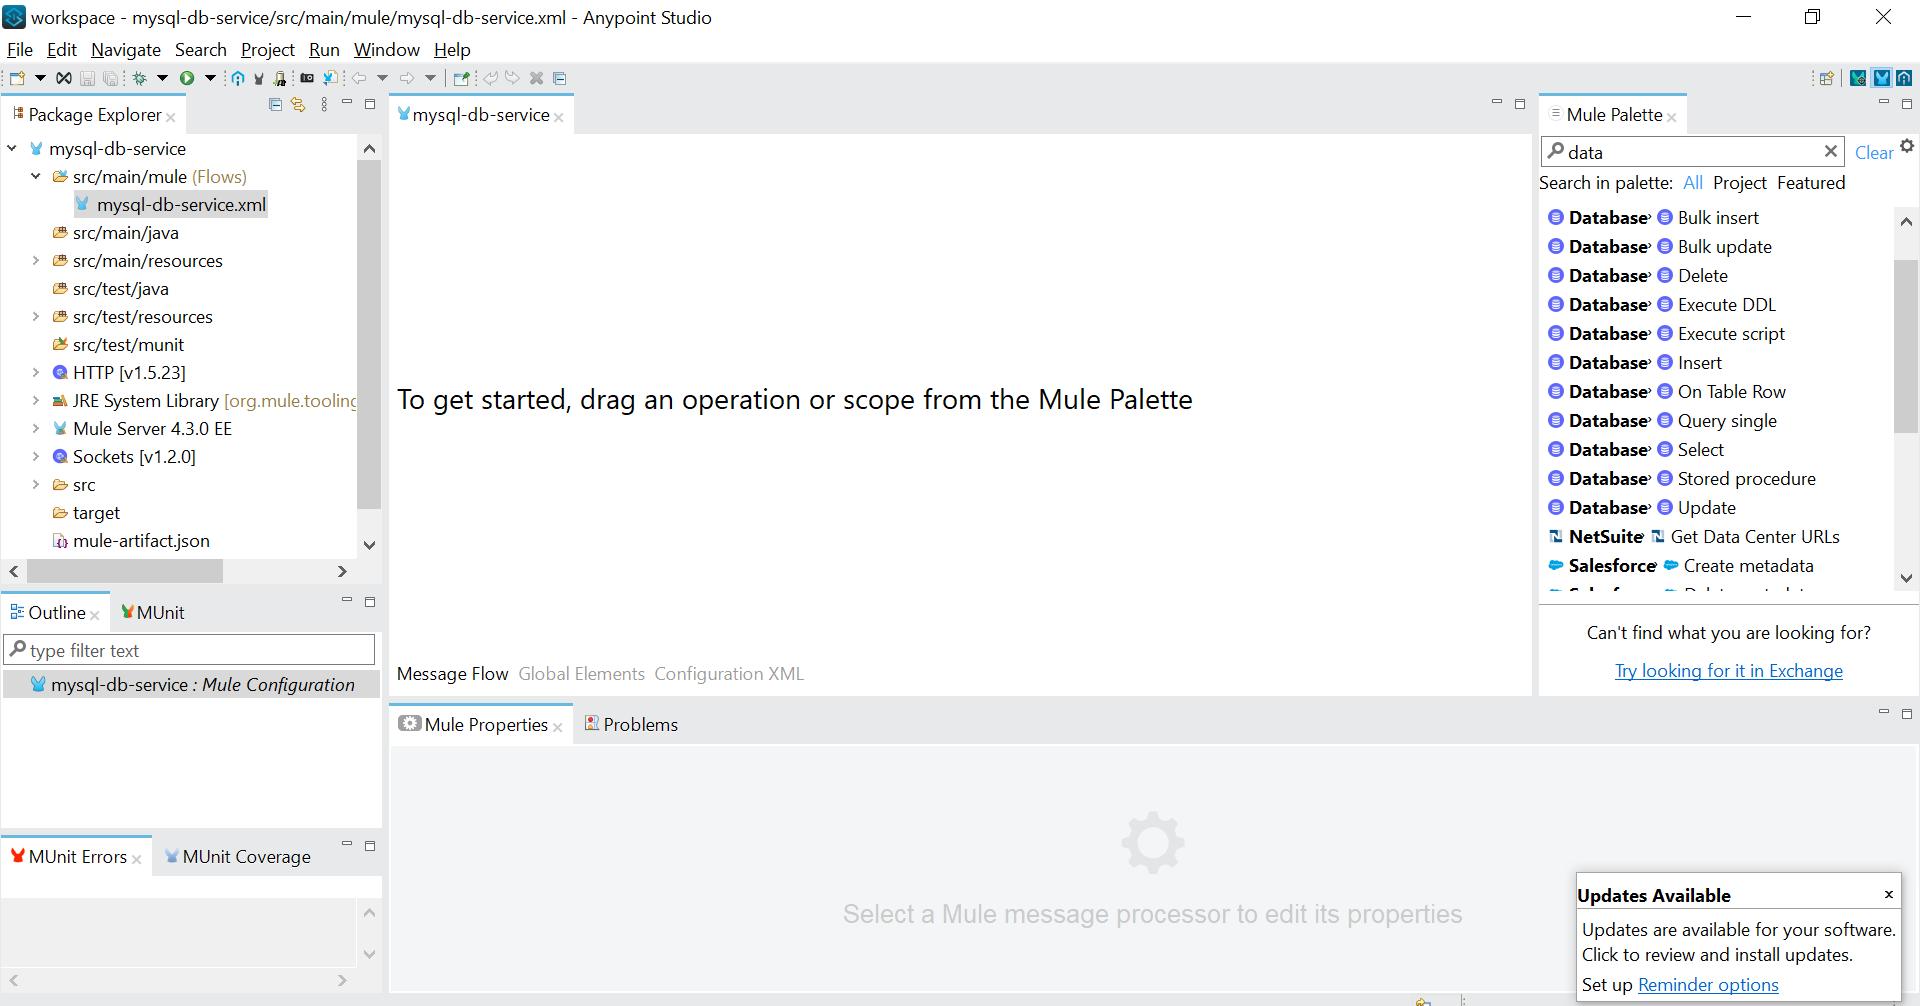 Update in MySQL DB table